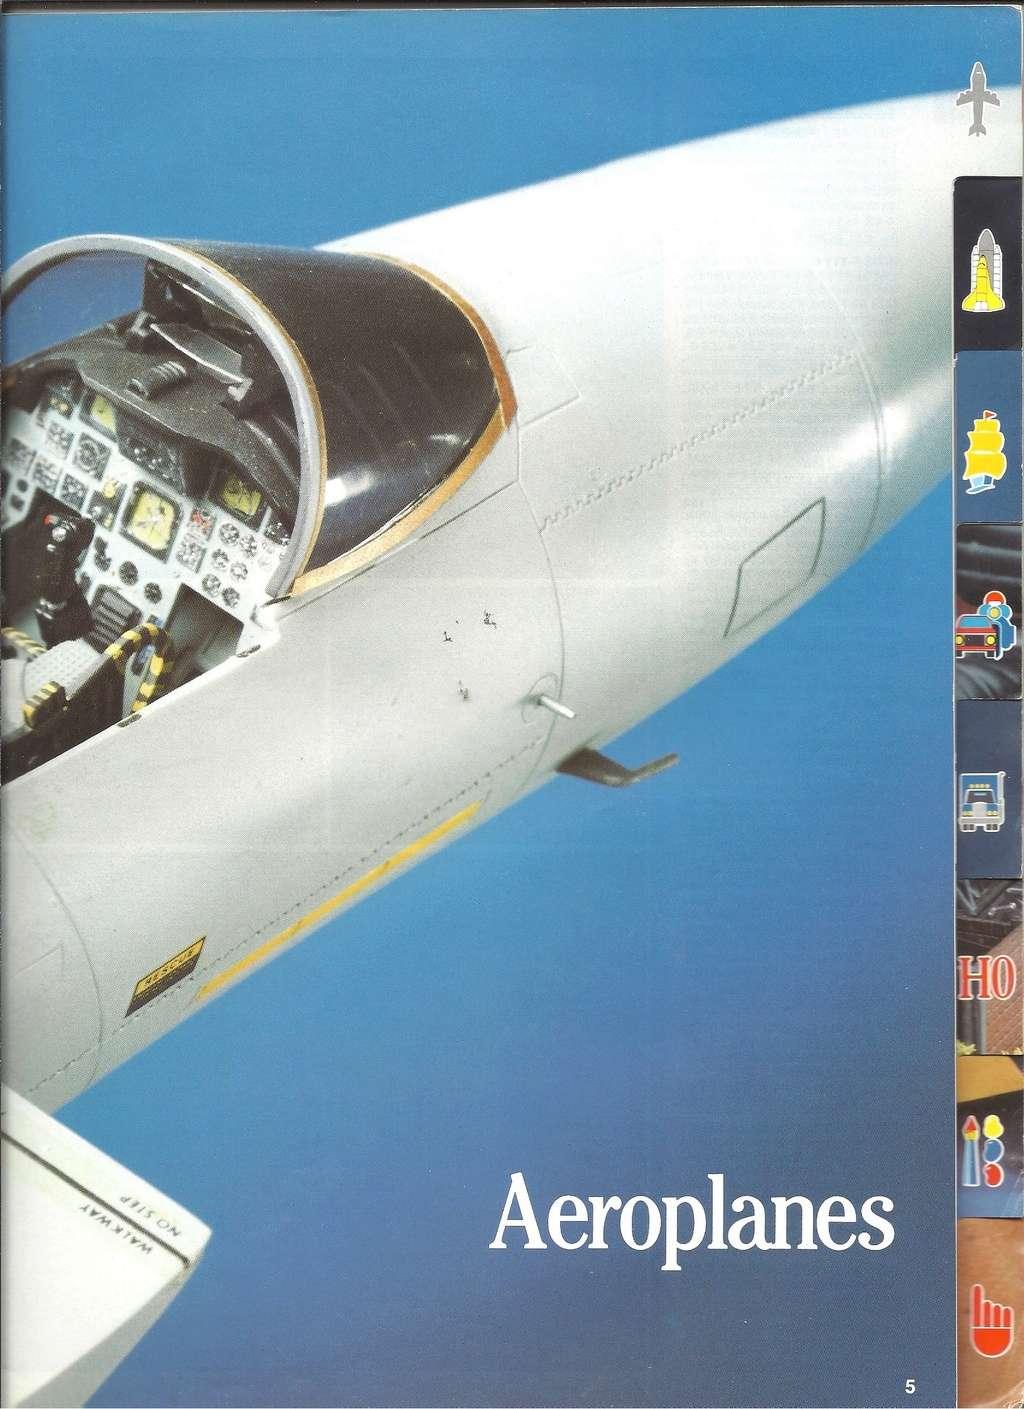 1984 - [REVELL 1984] Catalogue 1984  Revel127